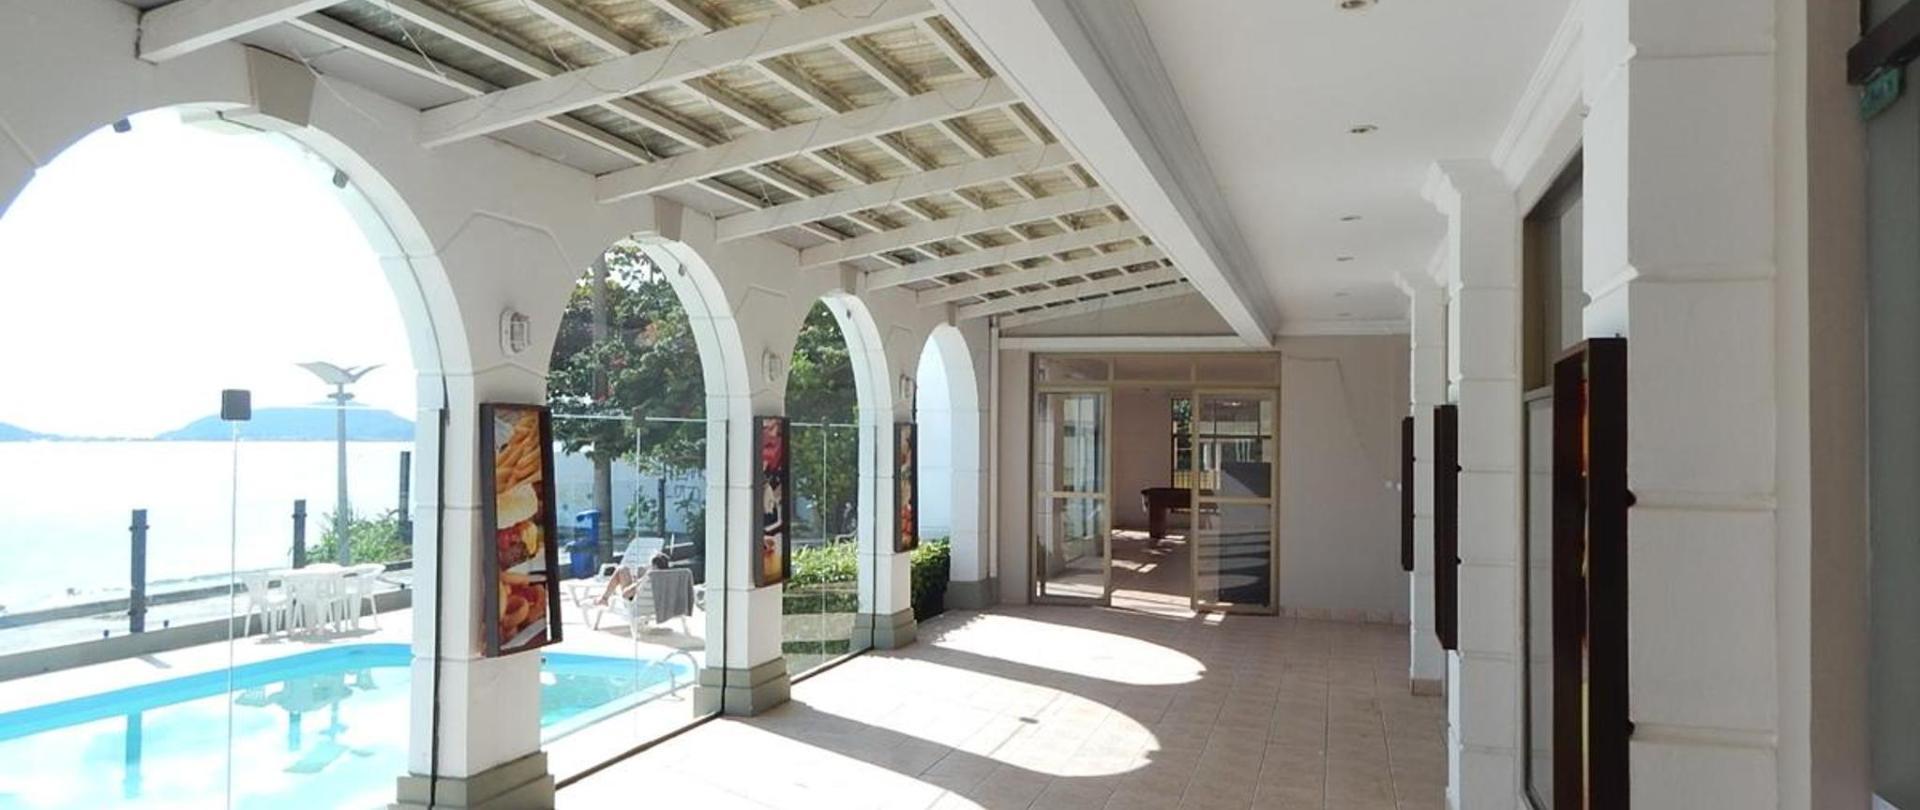 Hall piscina